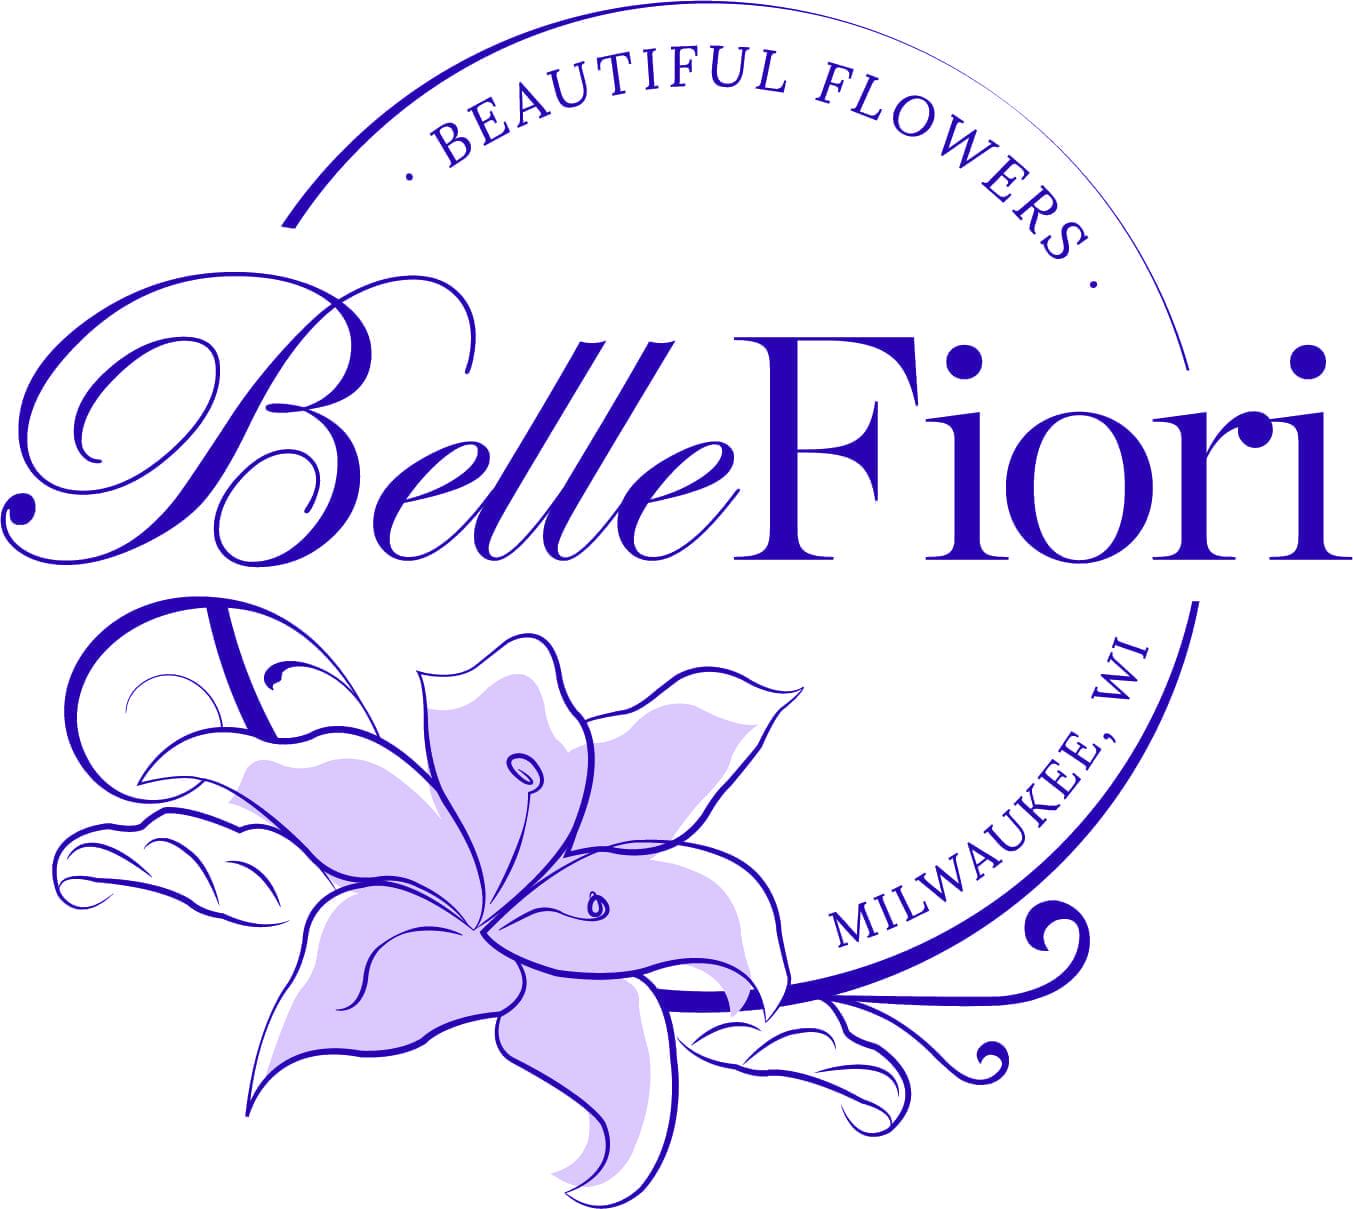 BelleFiori_Logo_FullLogo_FullColor-Belle-FioriMKE-1-2